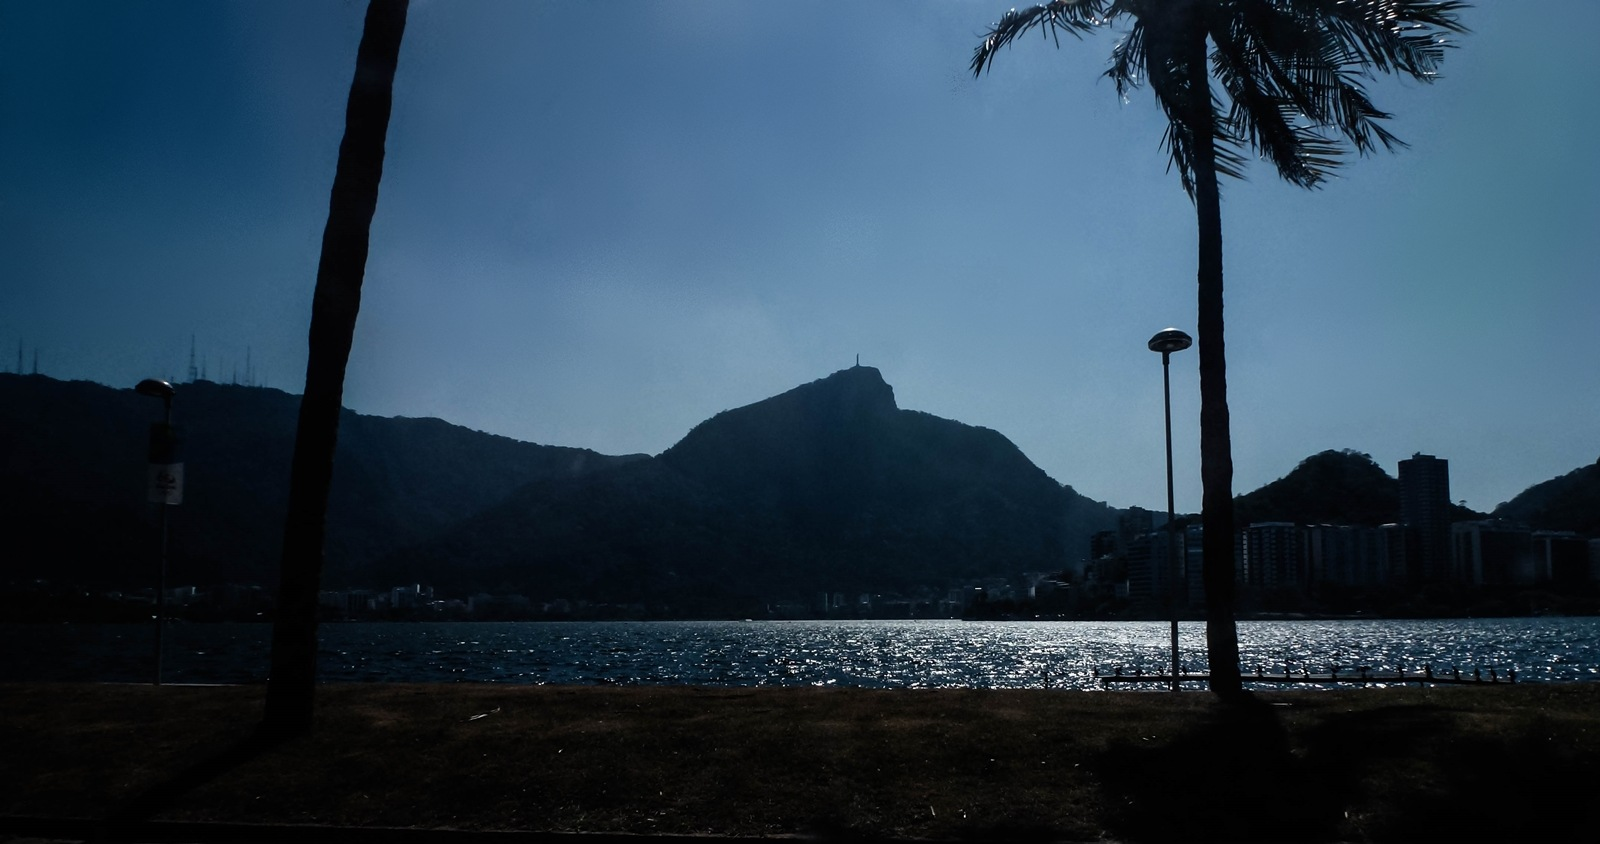 Lagoa by tecajanone